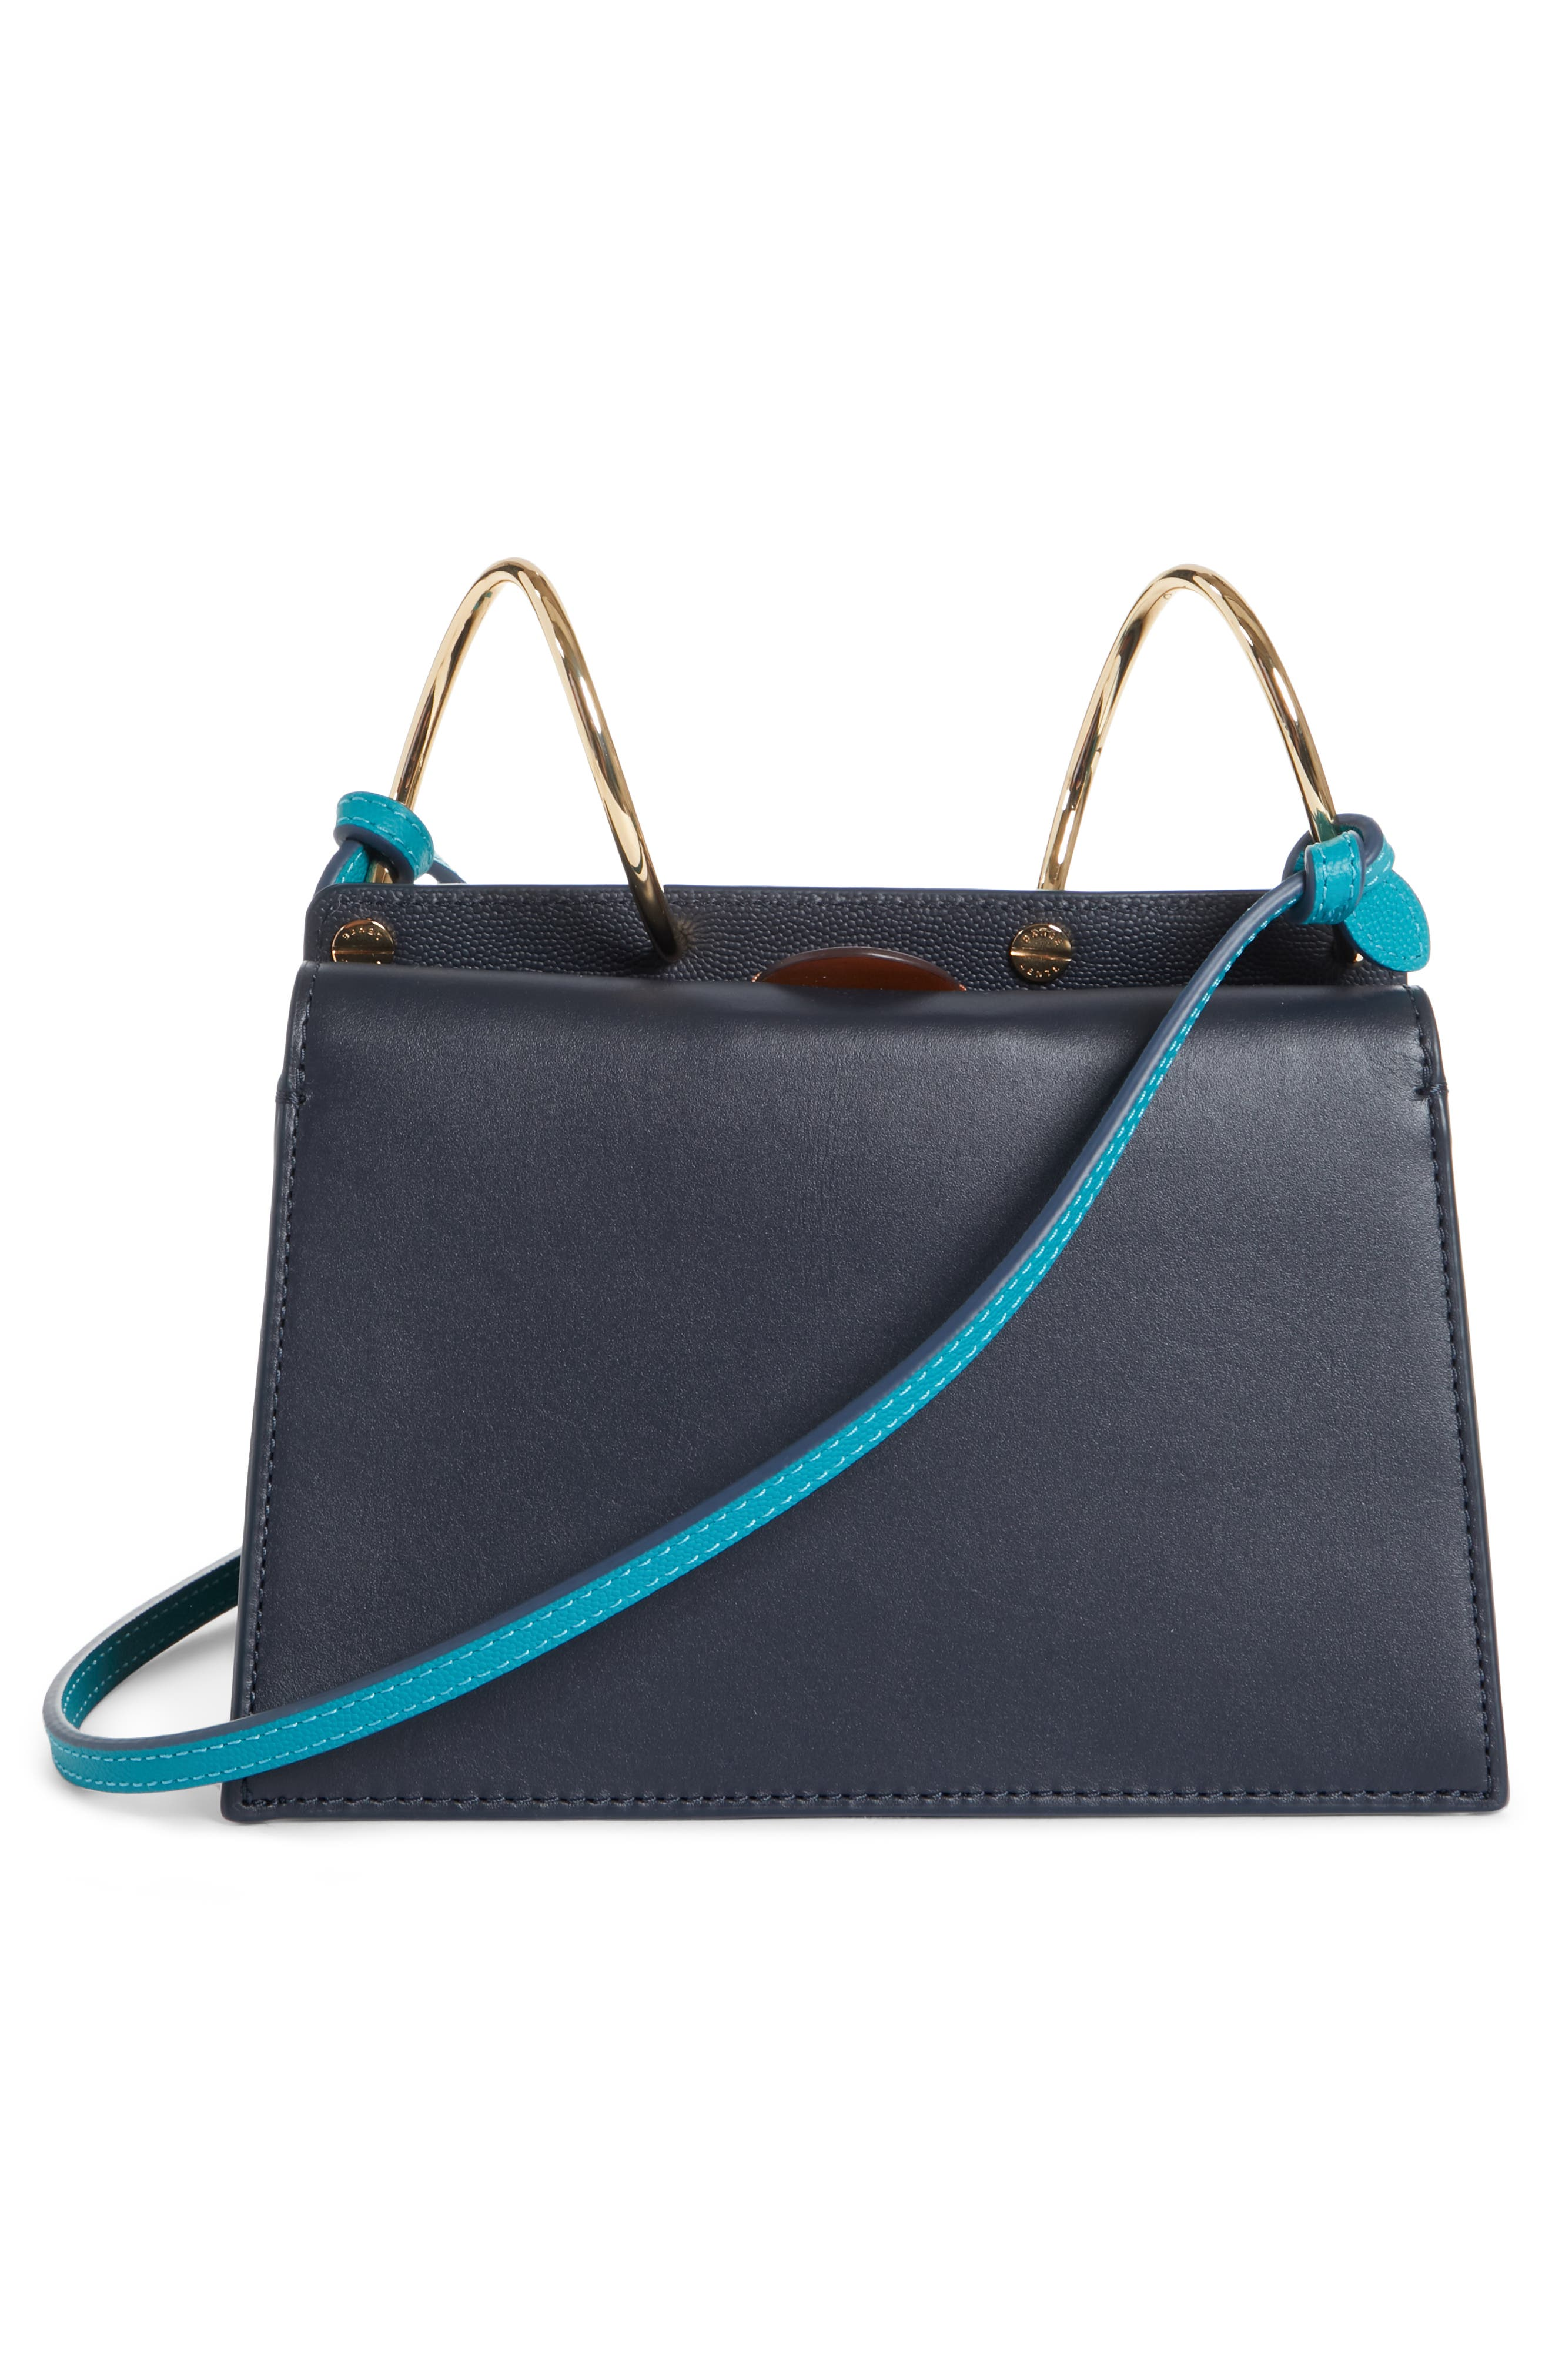 Mini Phoebe Leather Bag,                             Alternate thumbnail 3, color,                             CURLY SHEARLING WHITE-MARINE